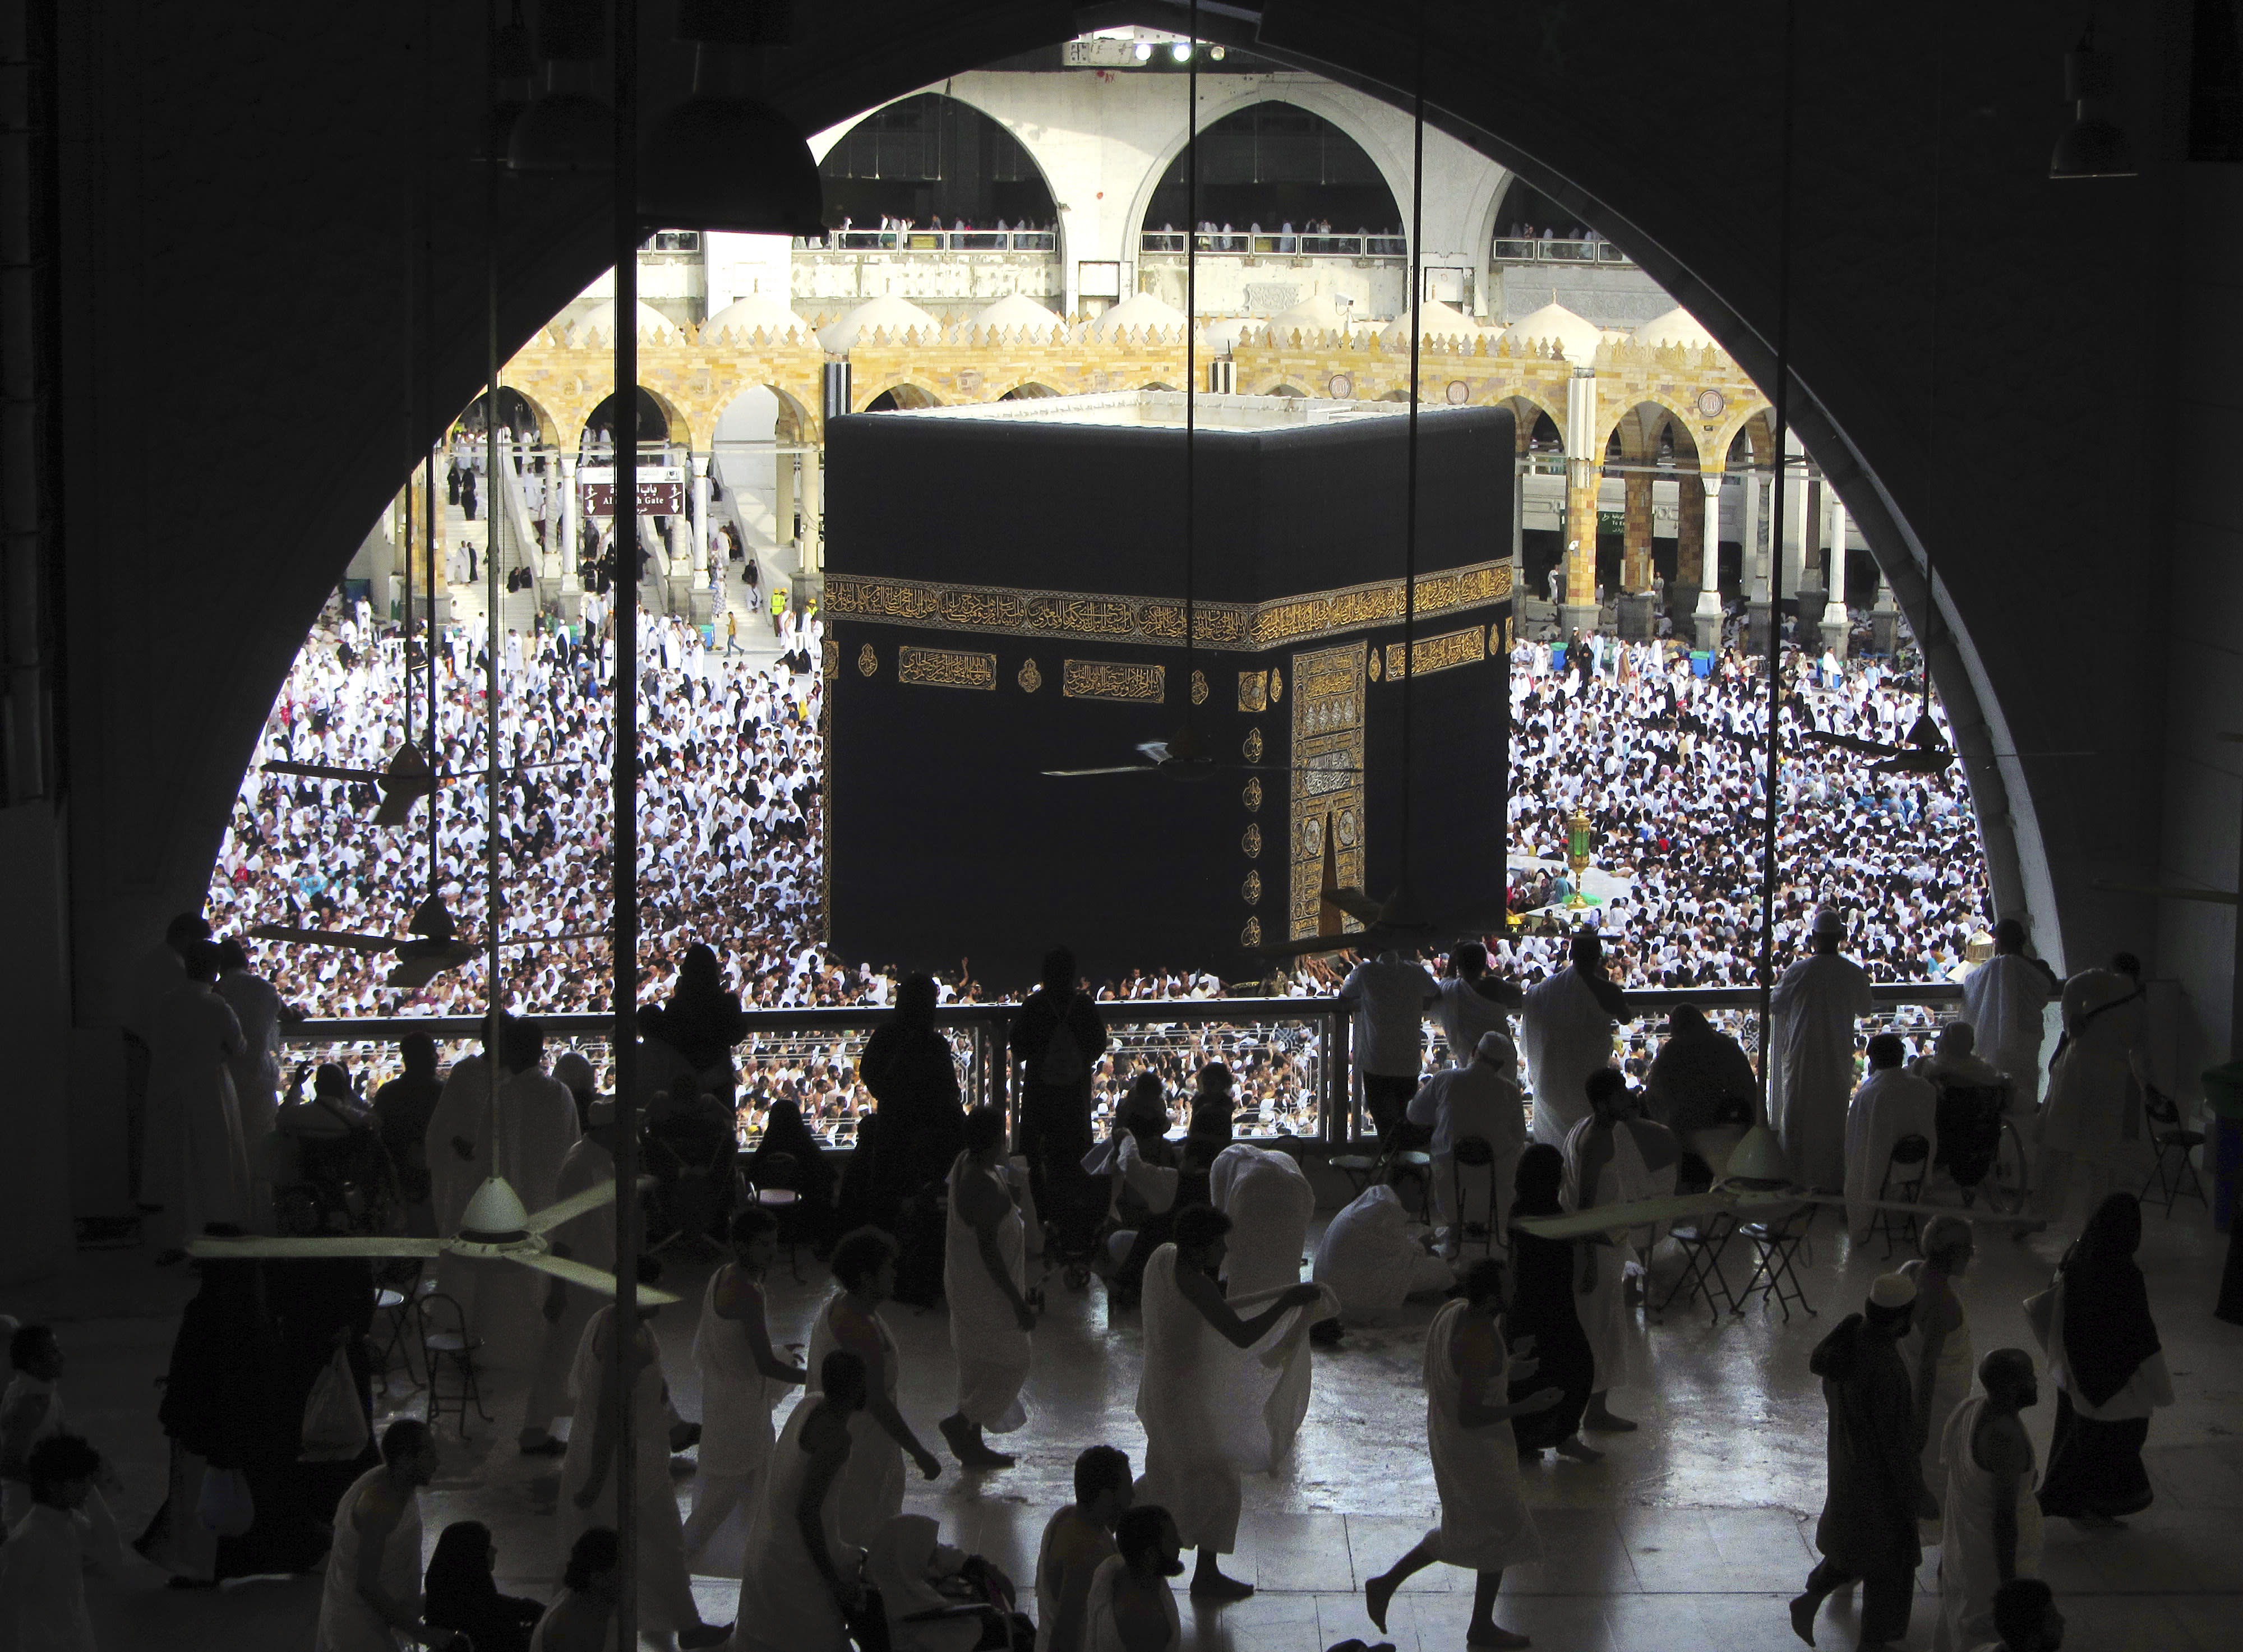 Saudi Arabia to launch app for Mecca pilgrims amid virus